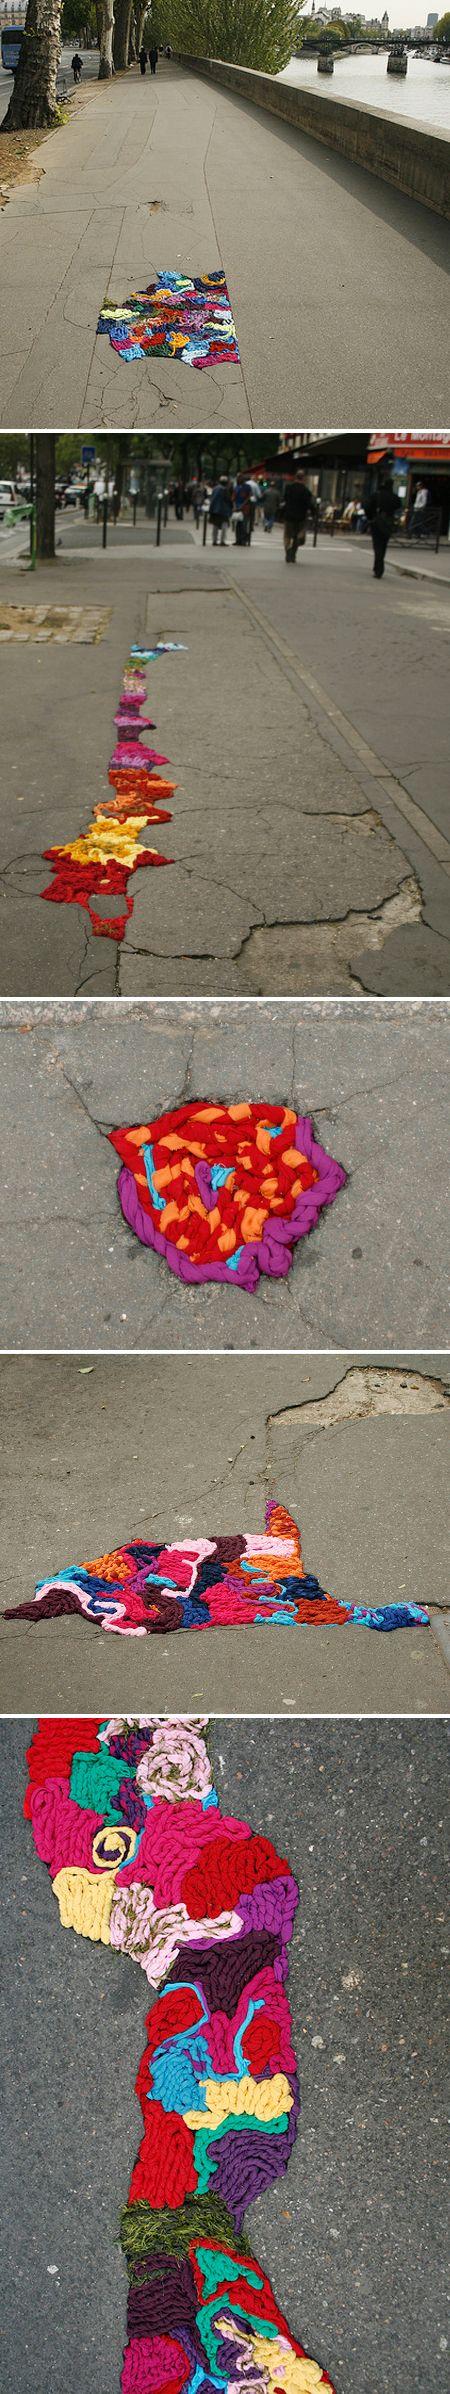 Color-filled potholes in Paris!    juliana_s_herrera